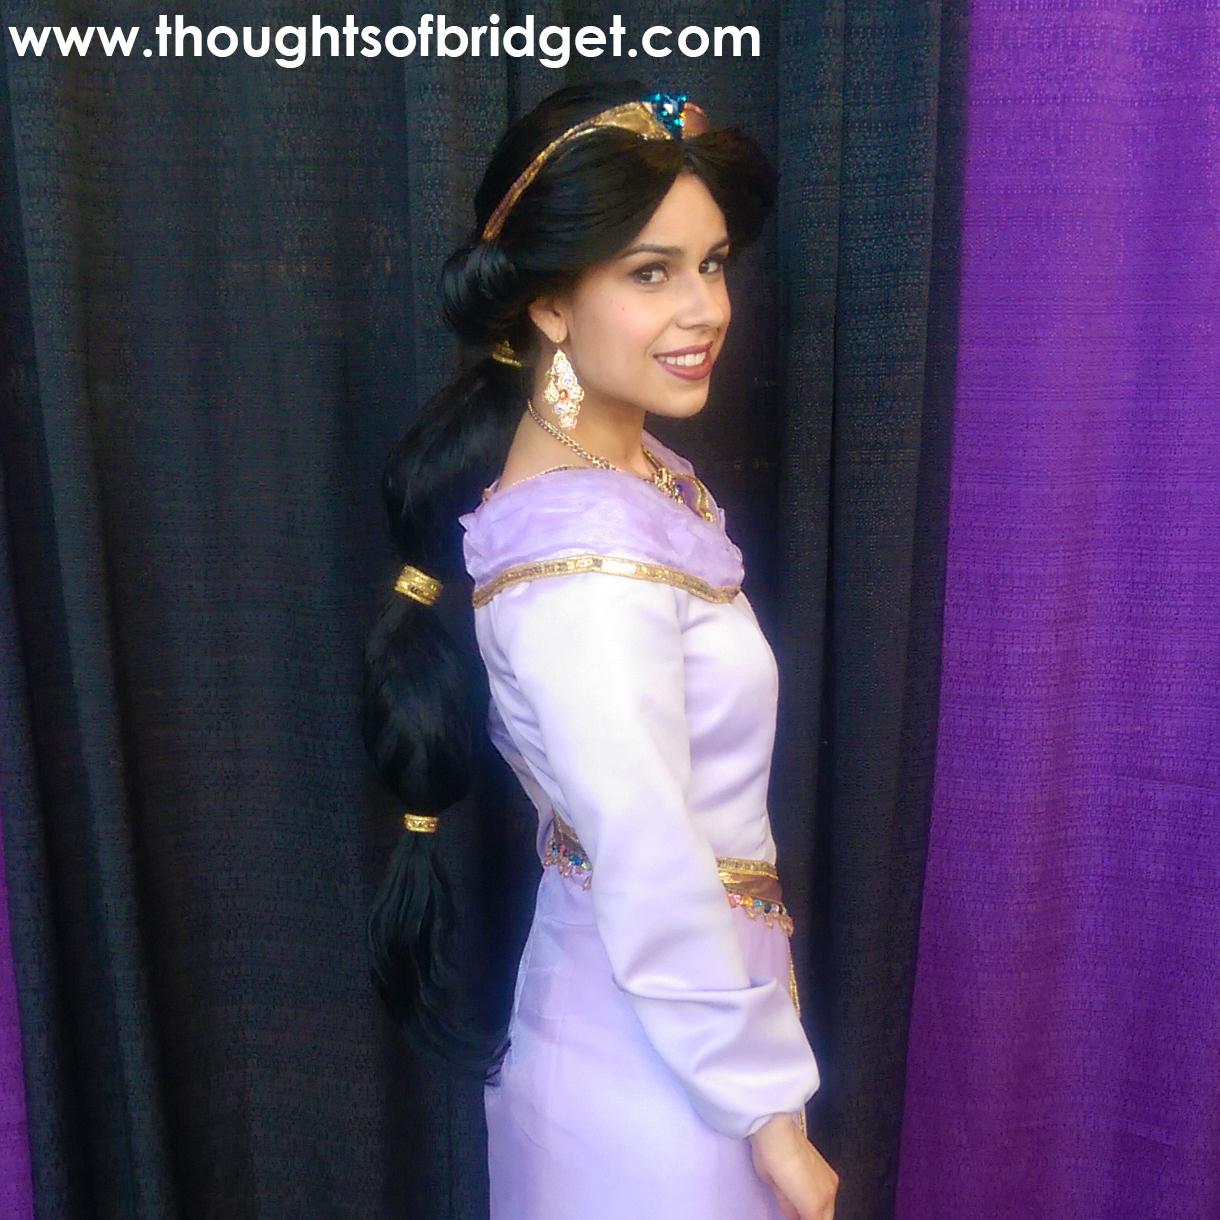 Thoughts Of Bridget Jasmine Wig Tutorial